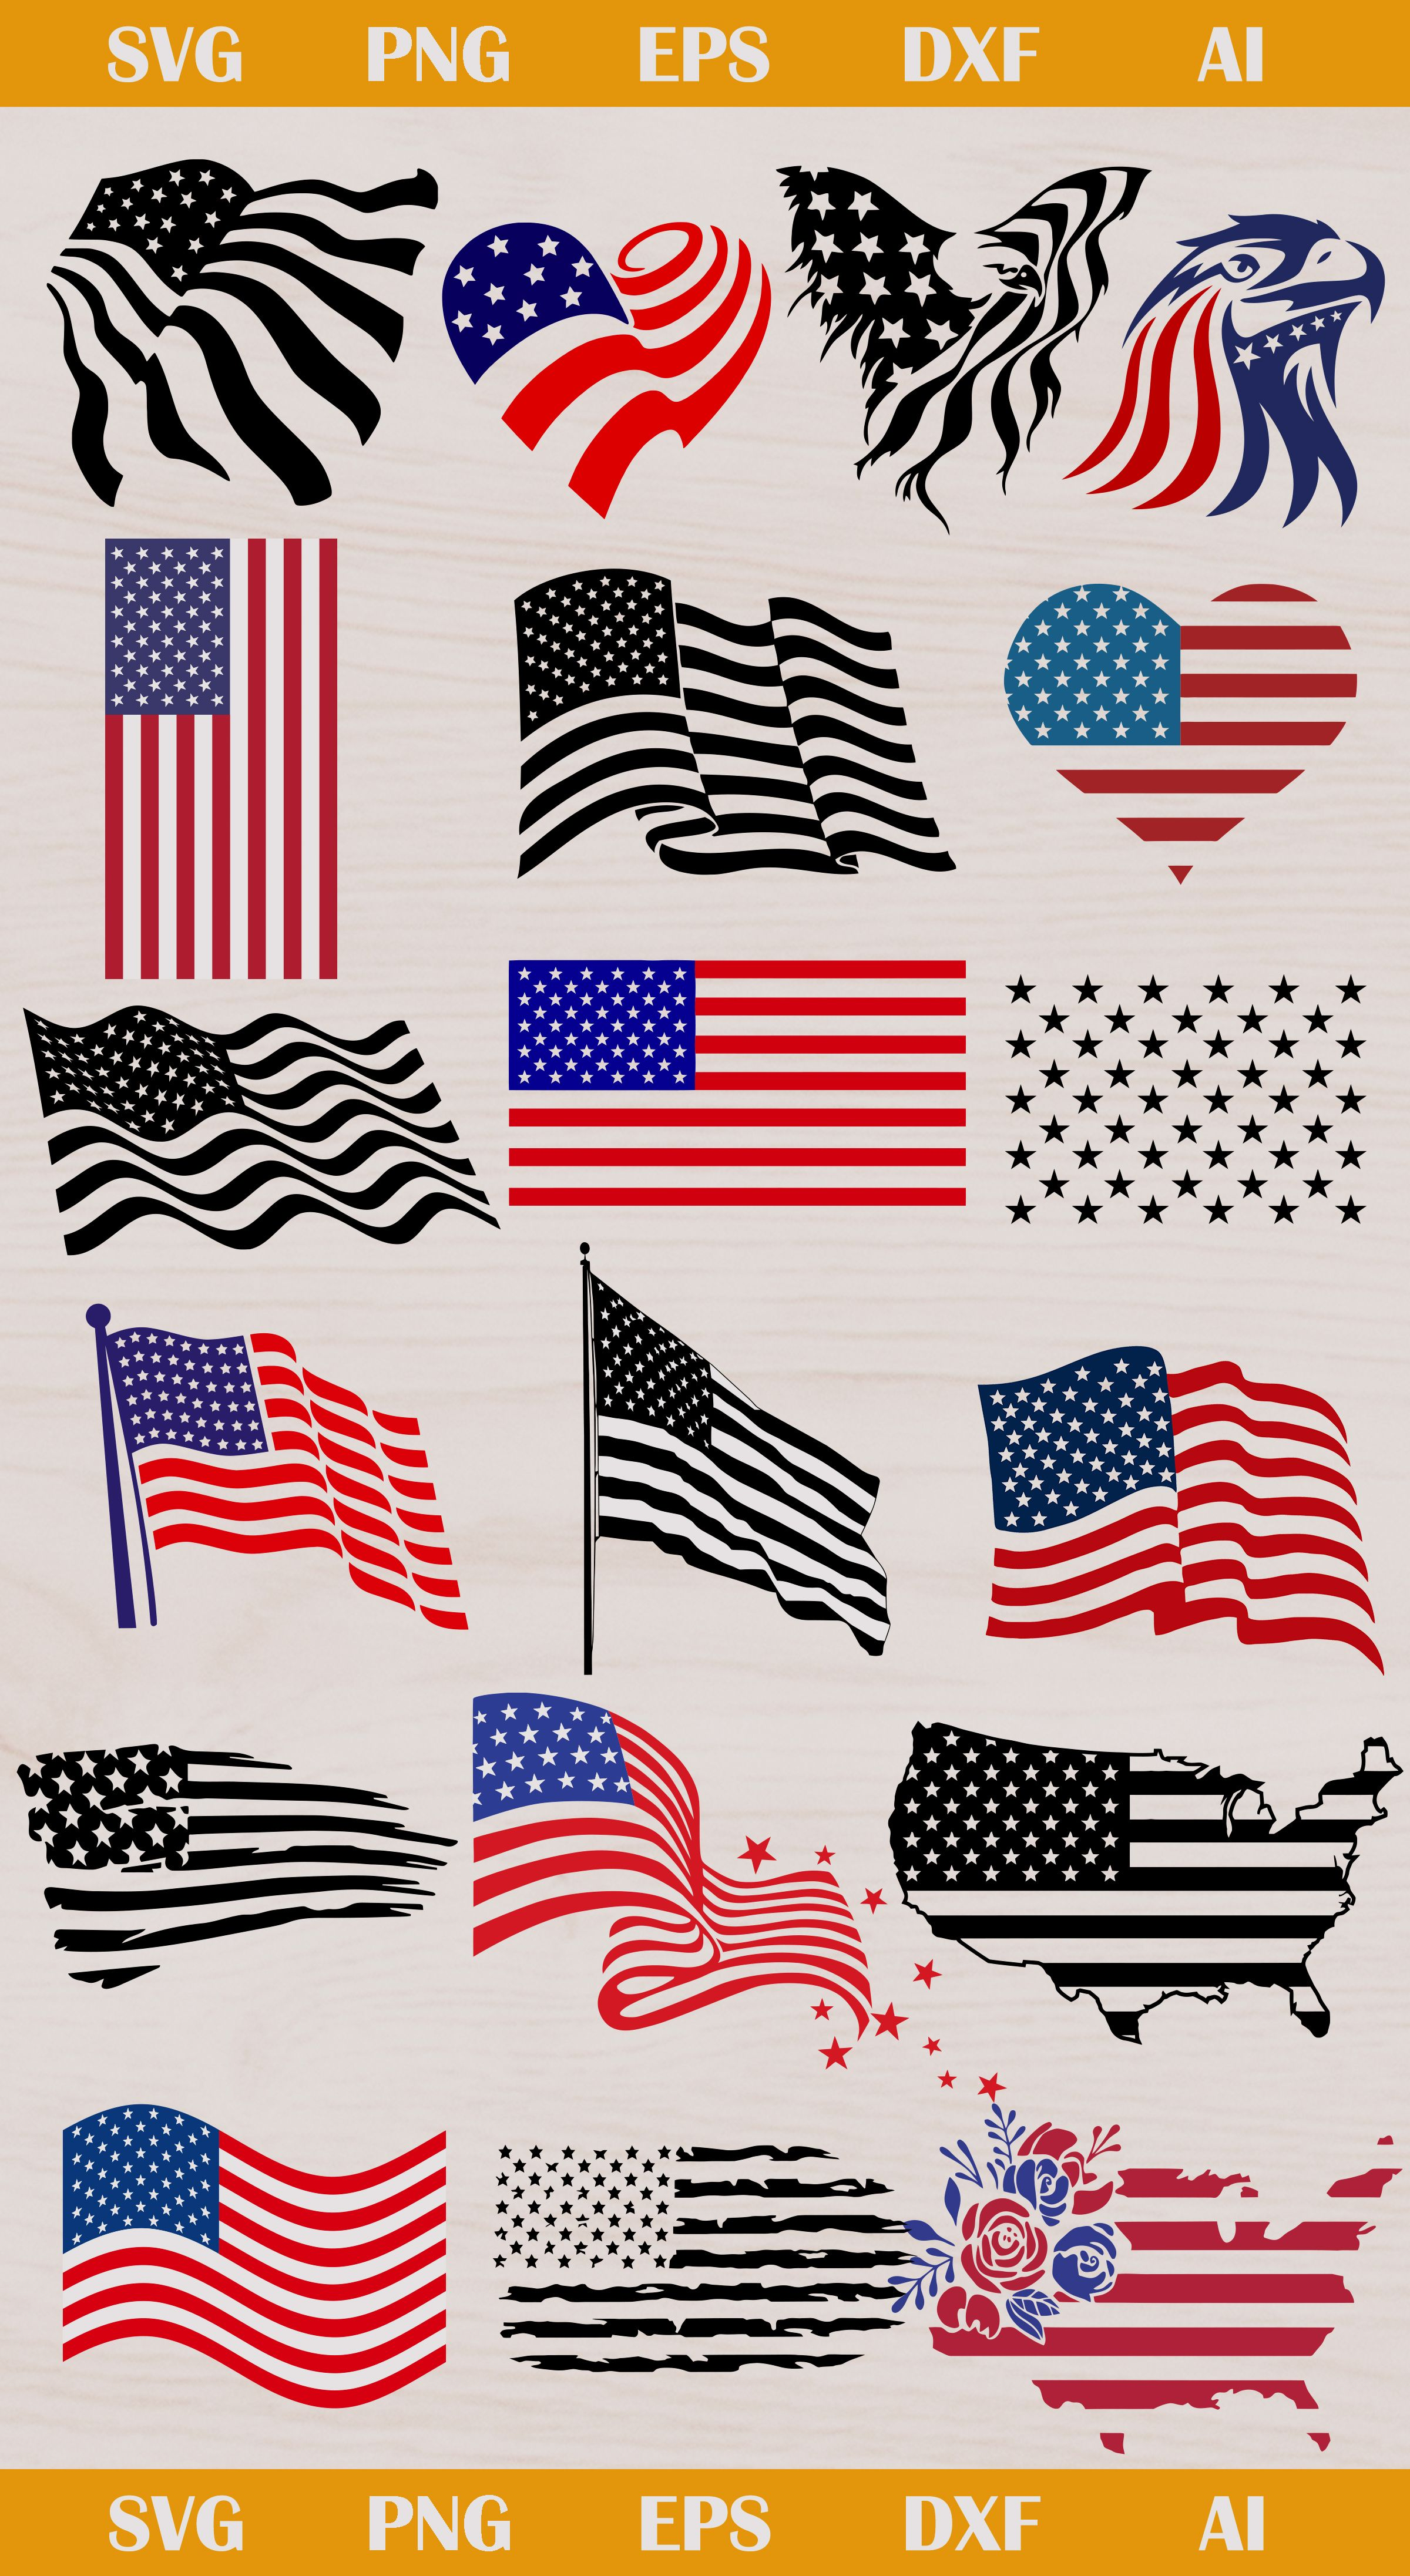 American Flag Svg Us Flag Svg Eps Dxf Ai Png Distressed Usa Flag Svg Usa Flag Day Flag Day Svg June 14th Svg American Flag Torn Sv Cricut Projects Vinyl Flag